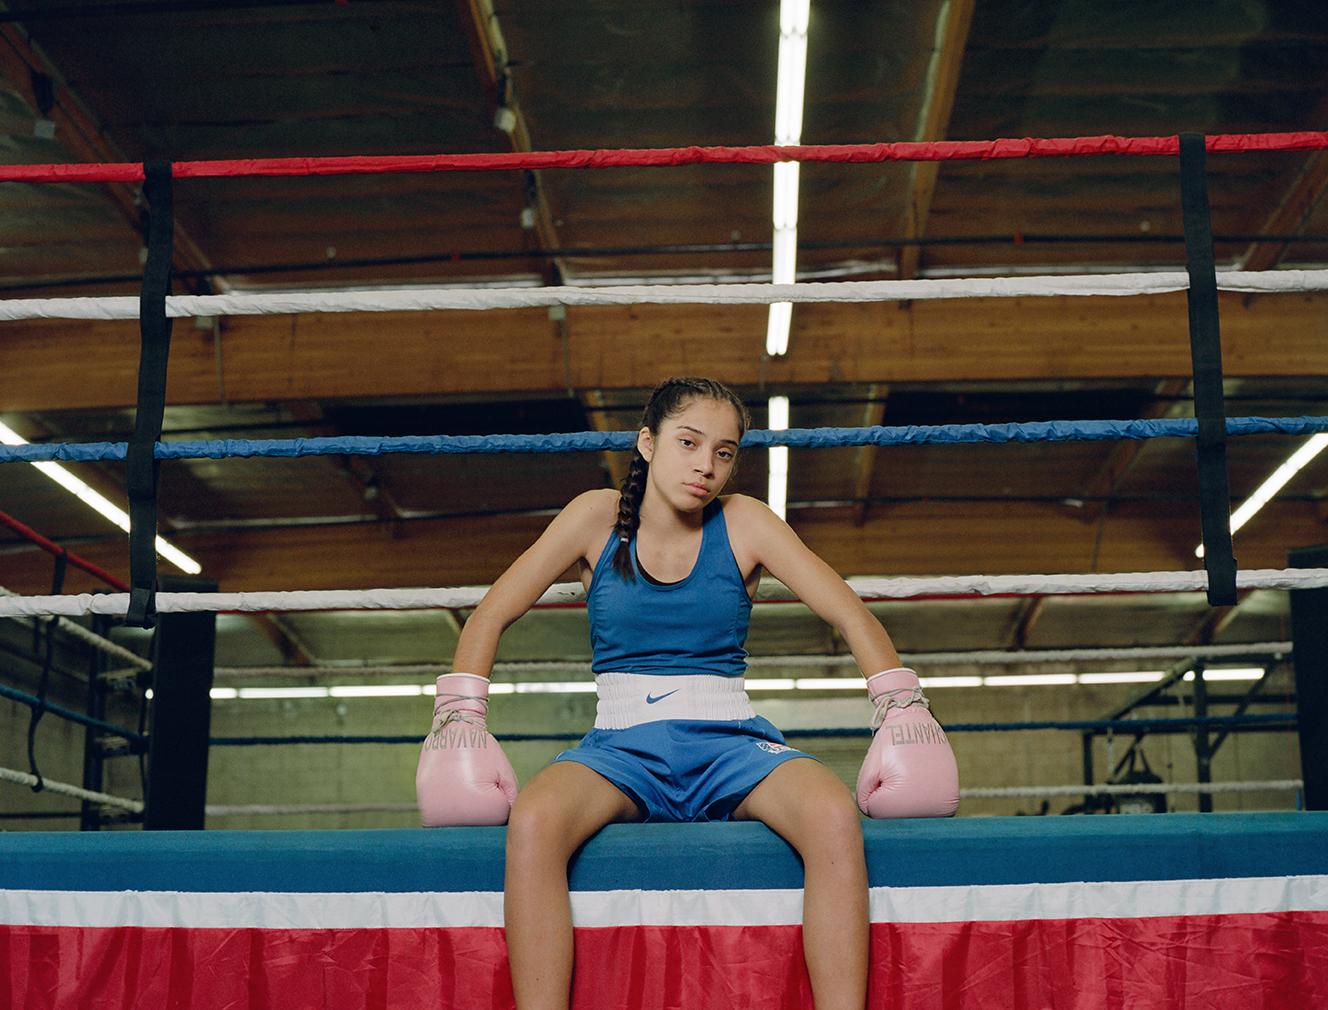 Nike_JDI_Chantel_image 06.jpg